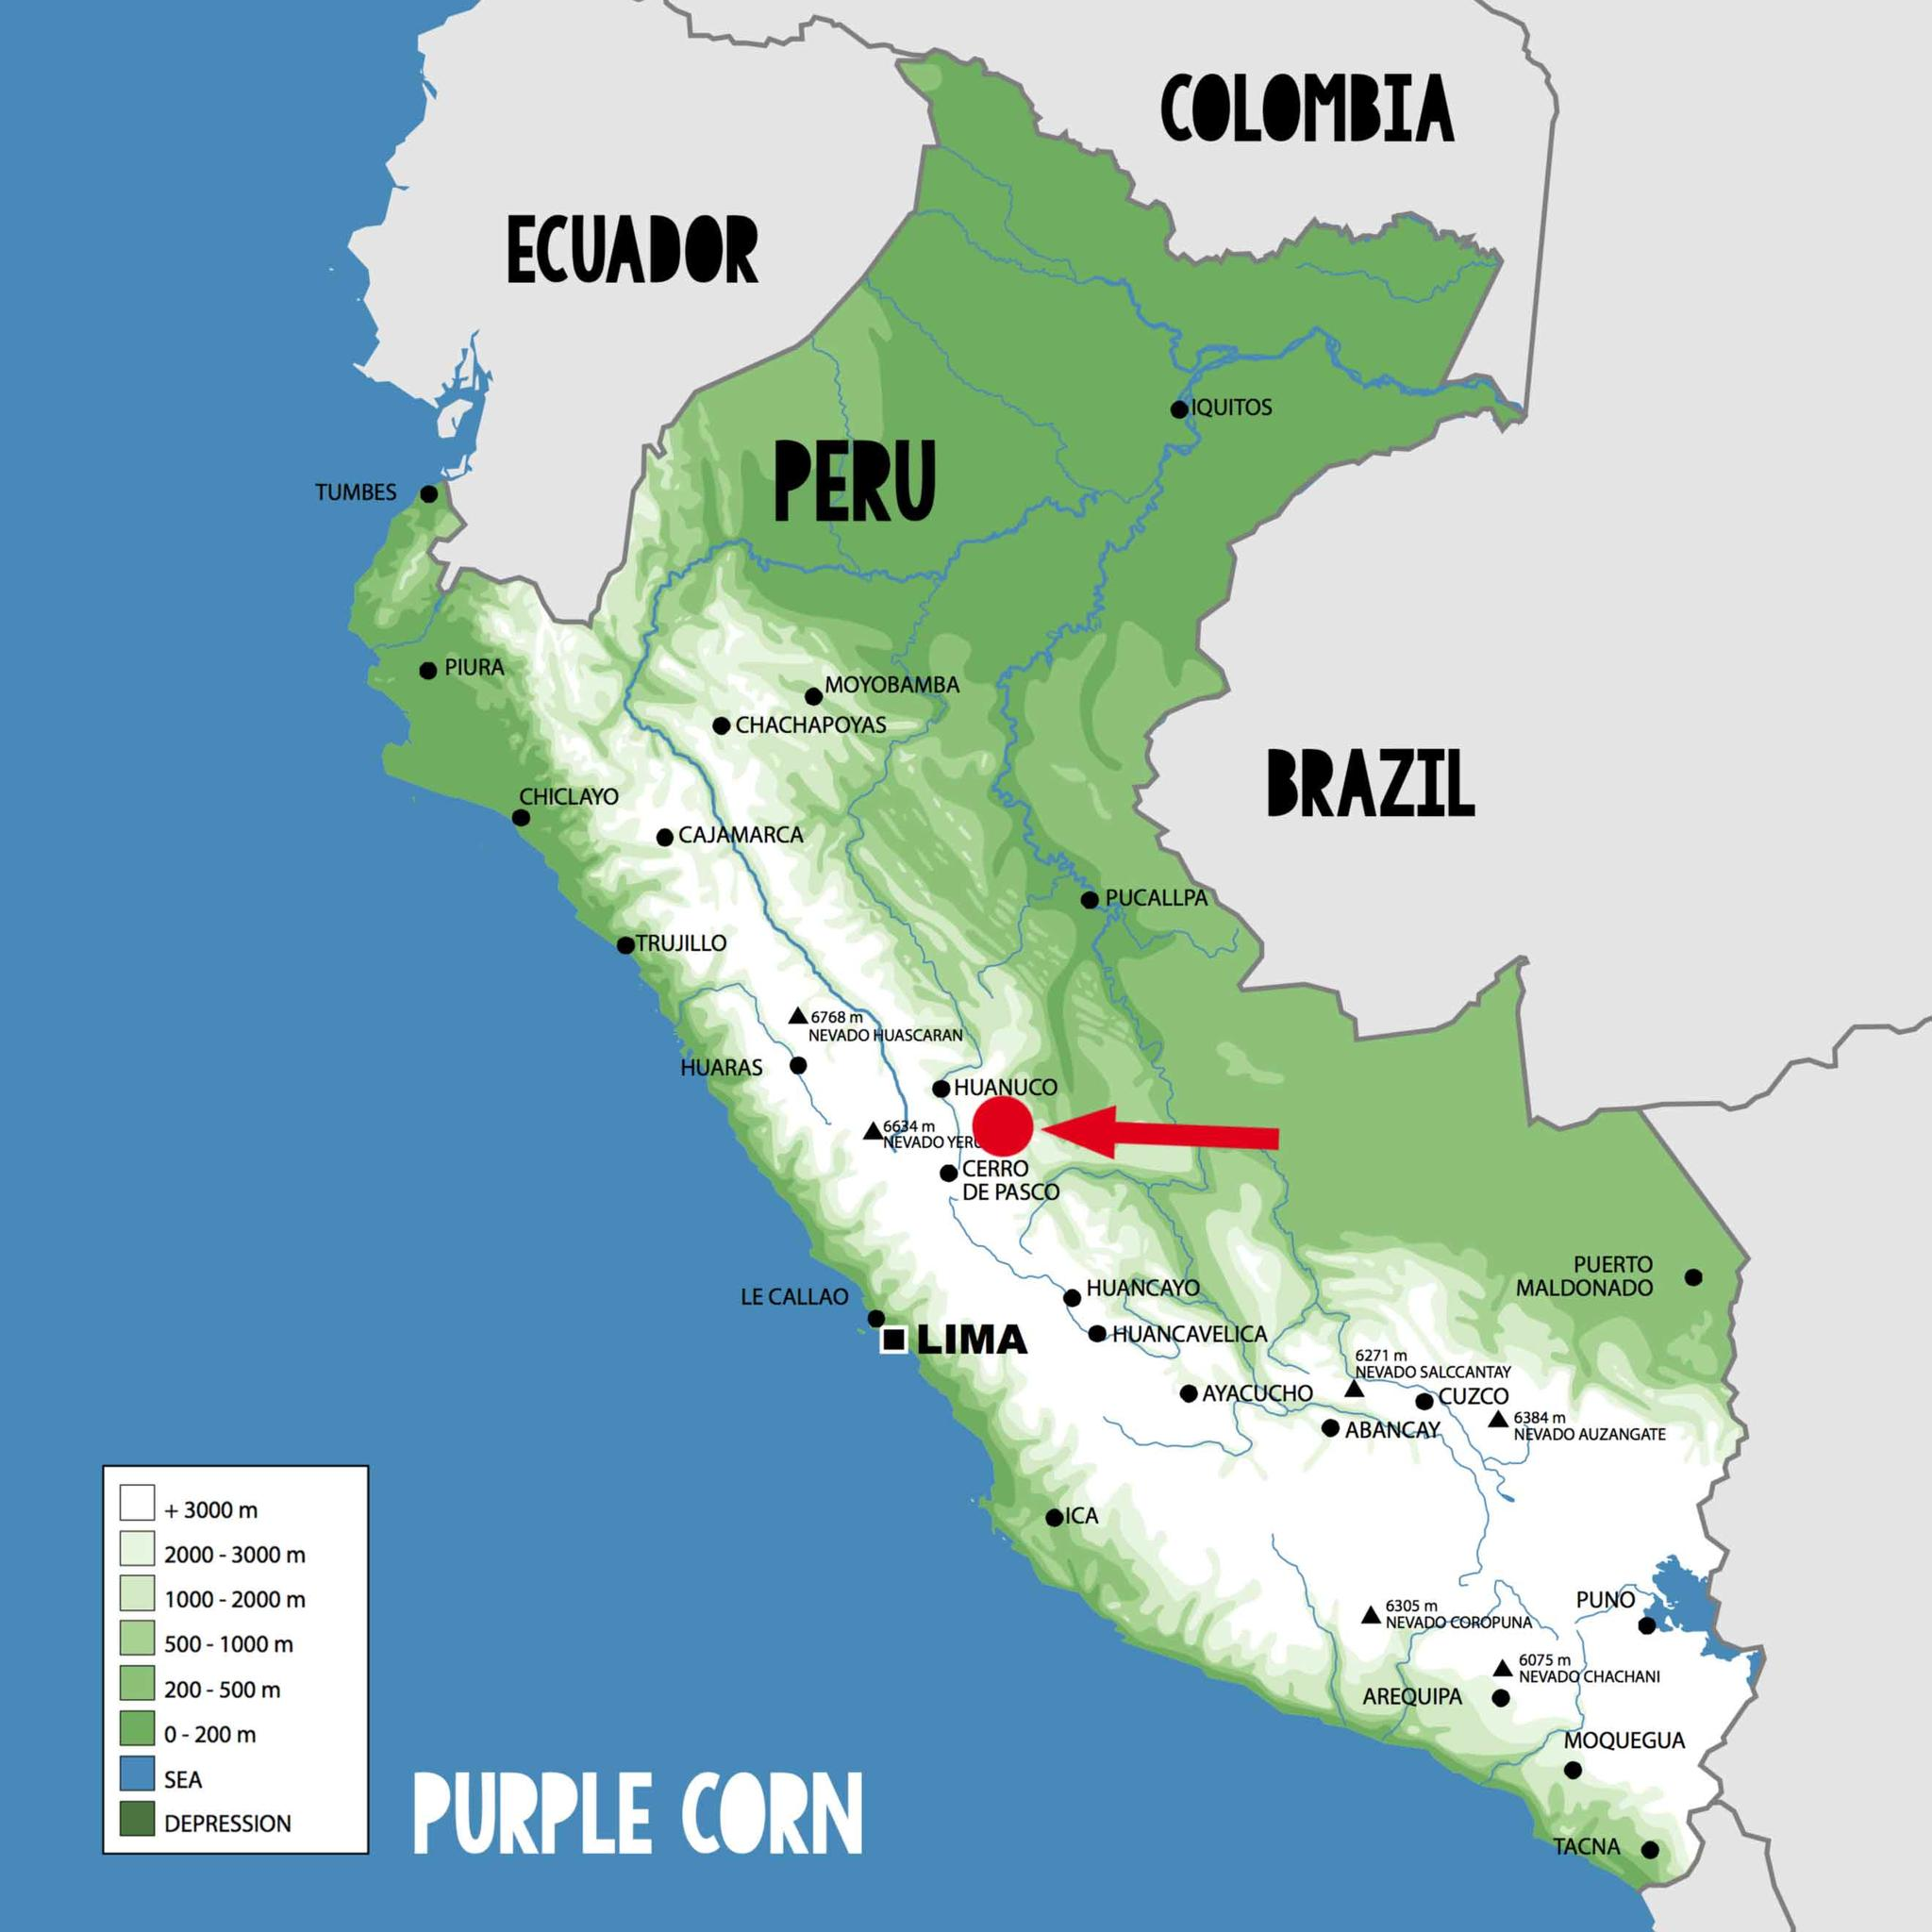 Purple Corn Ursprung